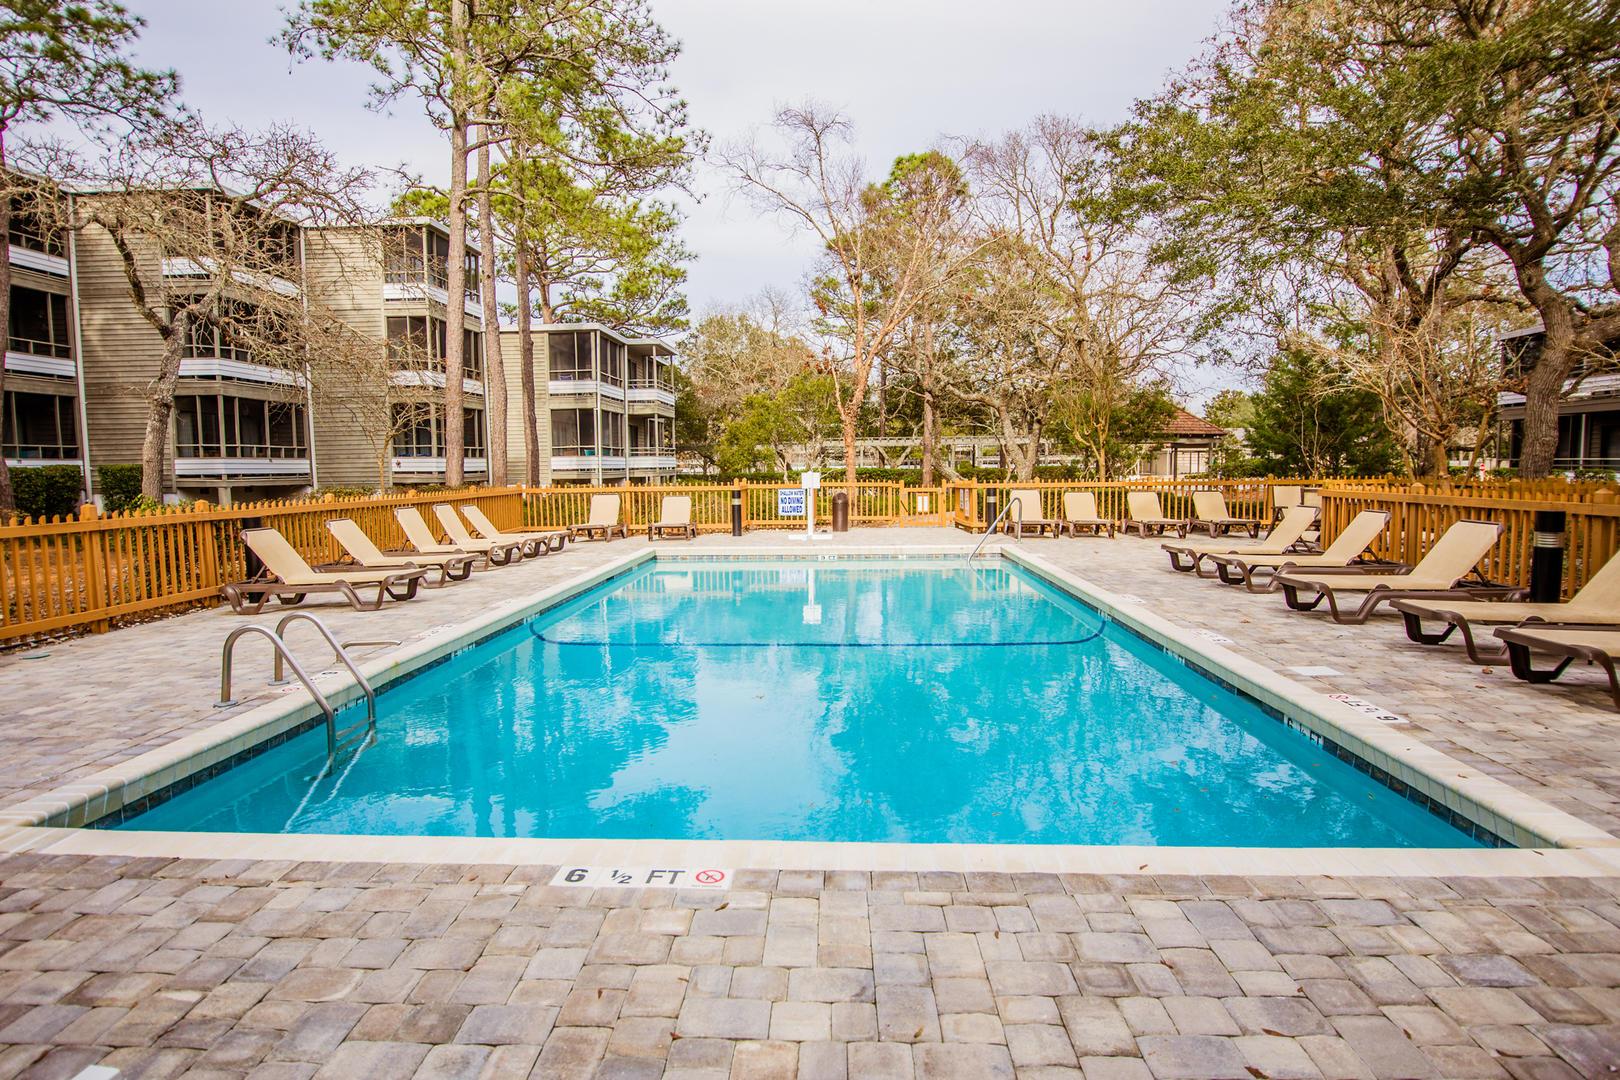 Ocean Creek L2274 - Lodge Outdoor Pool